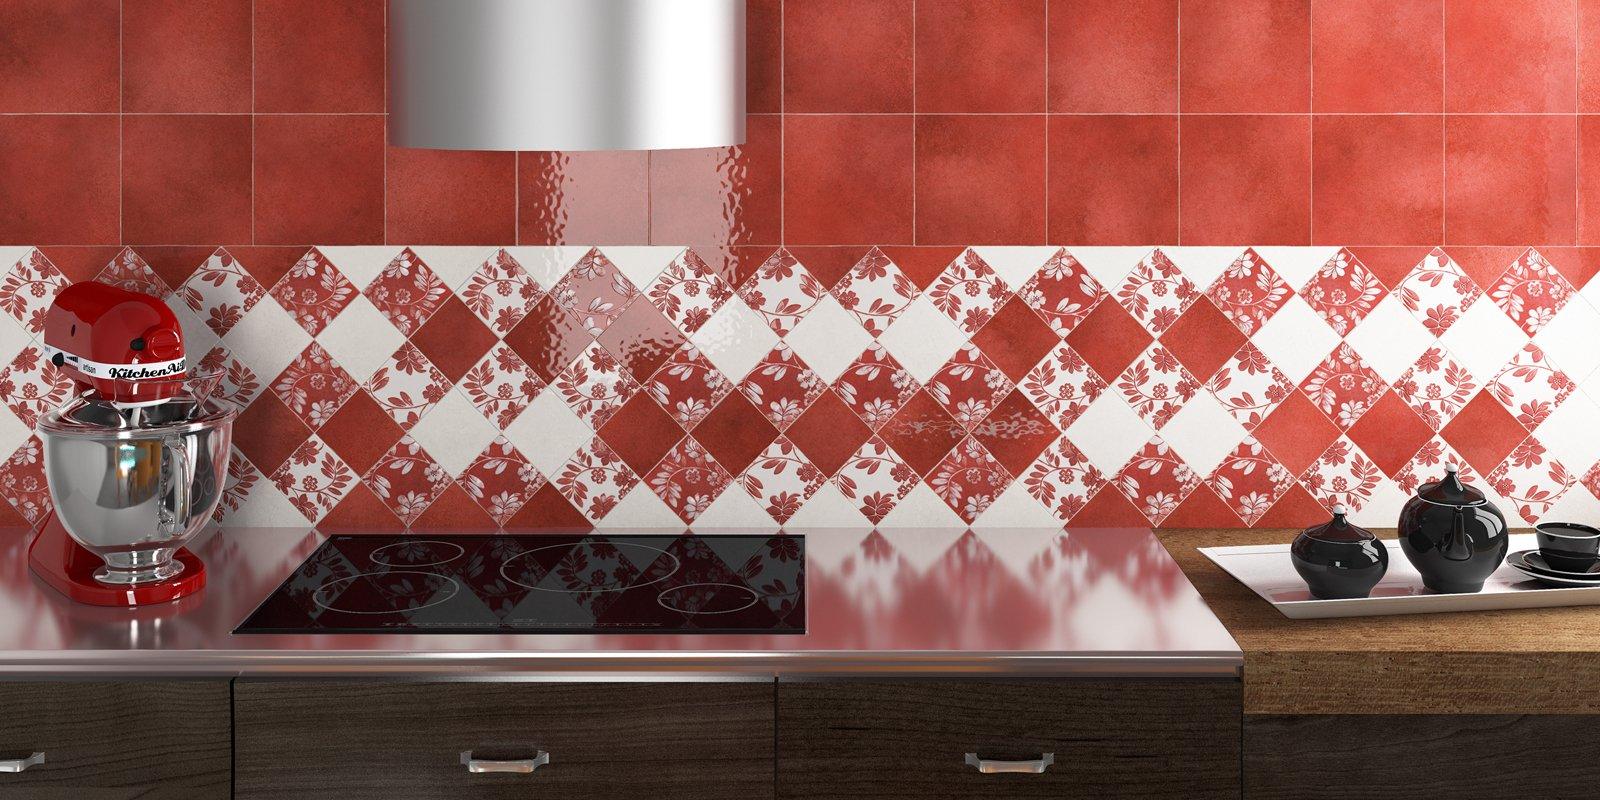 cucina: piastrelle per le pareti - cose di casa - Ceramica Cucina